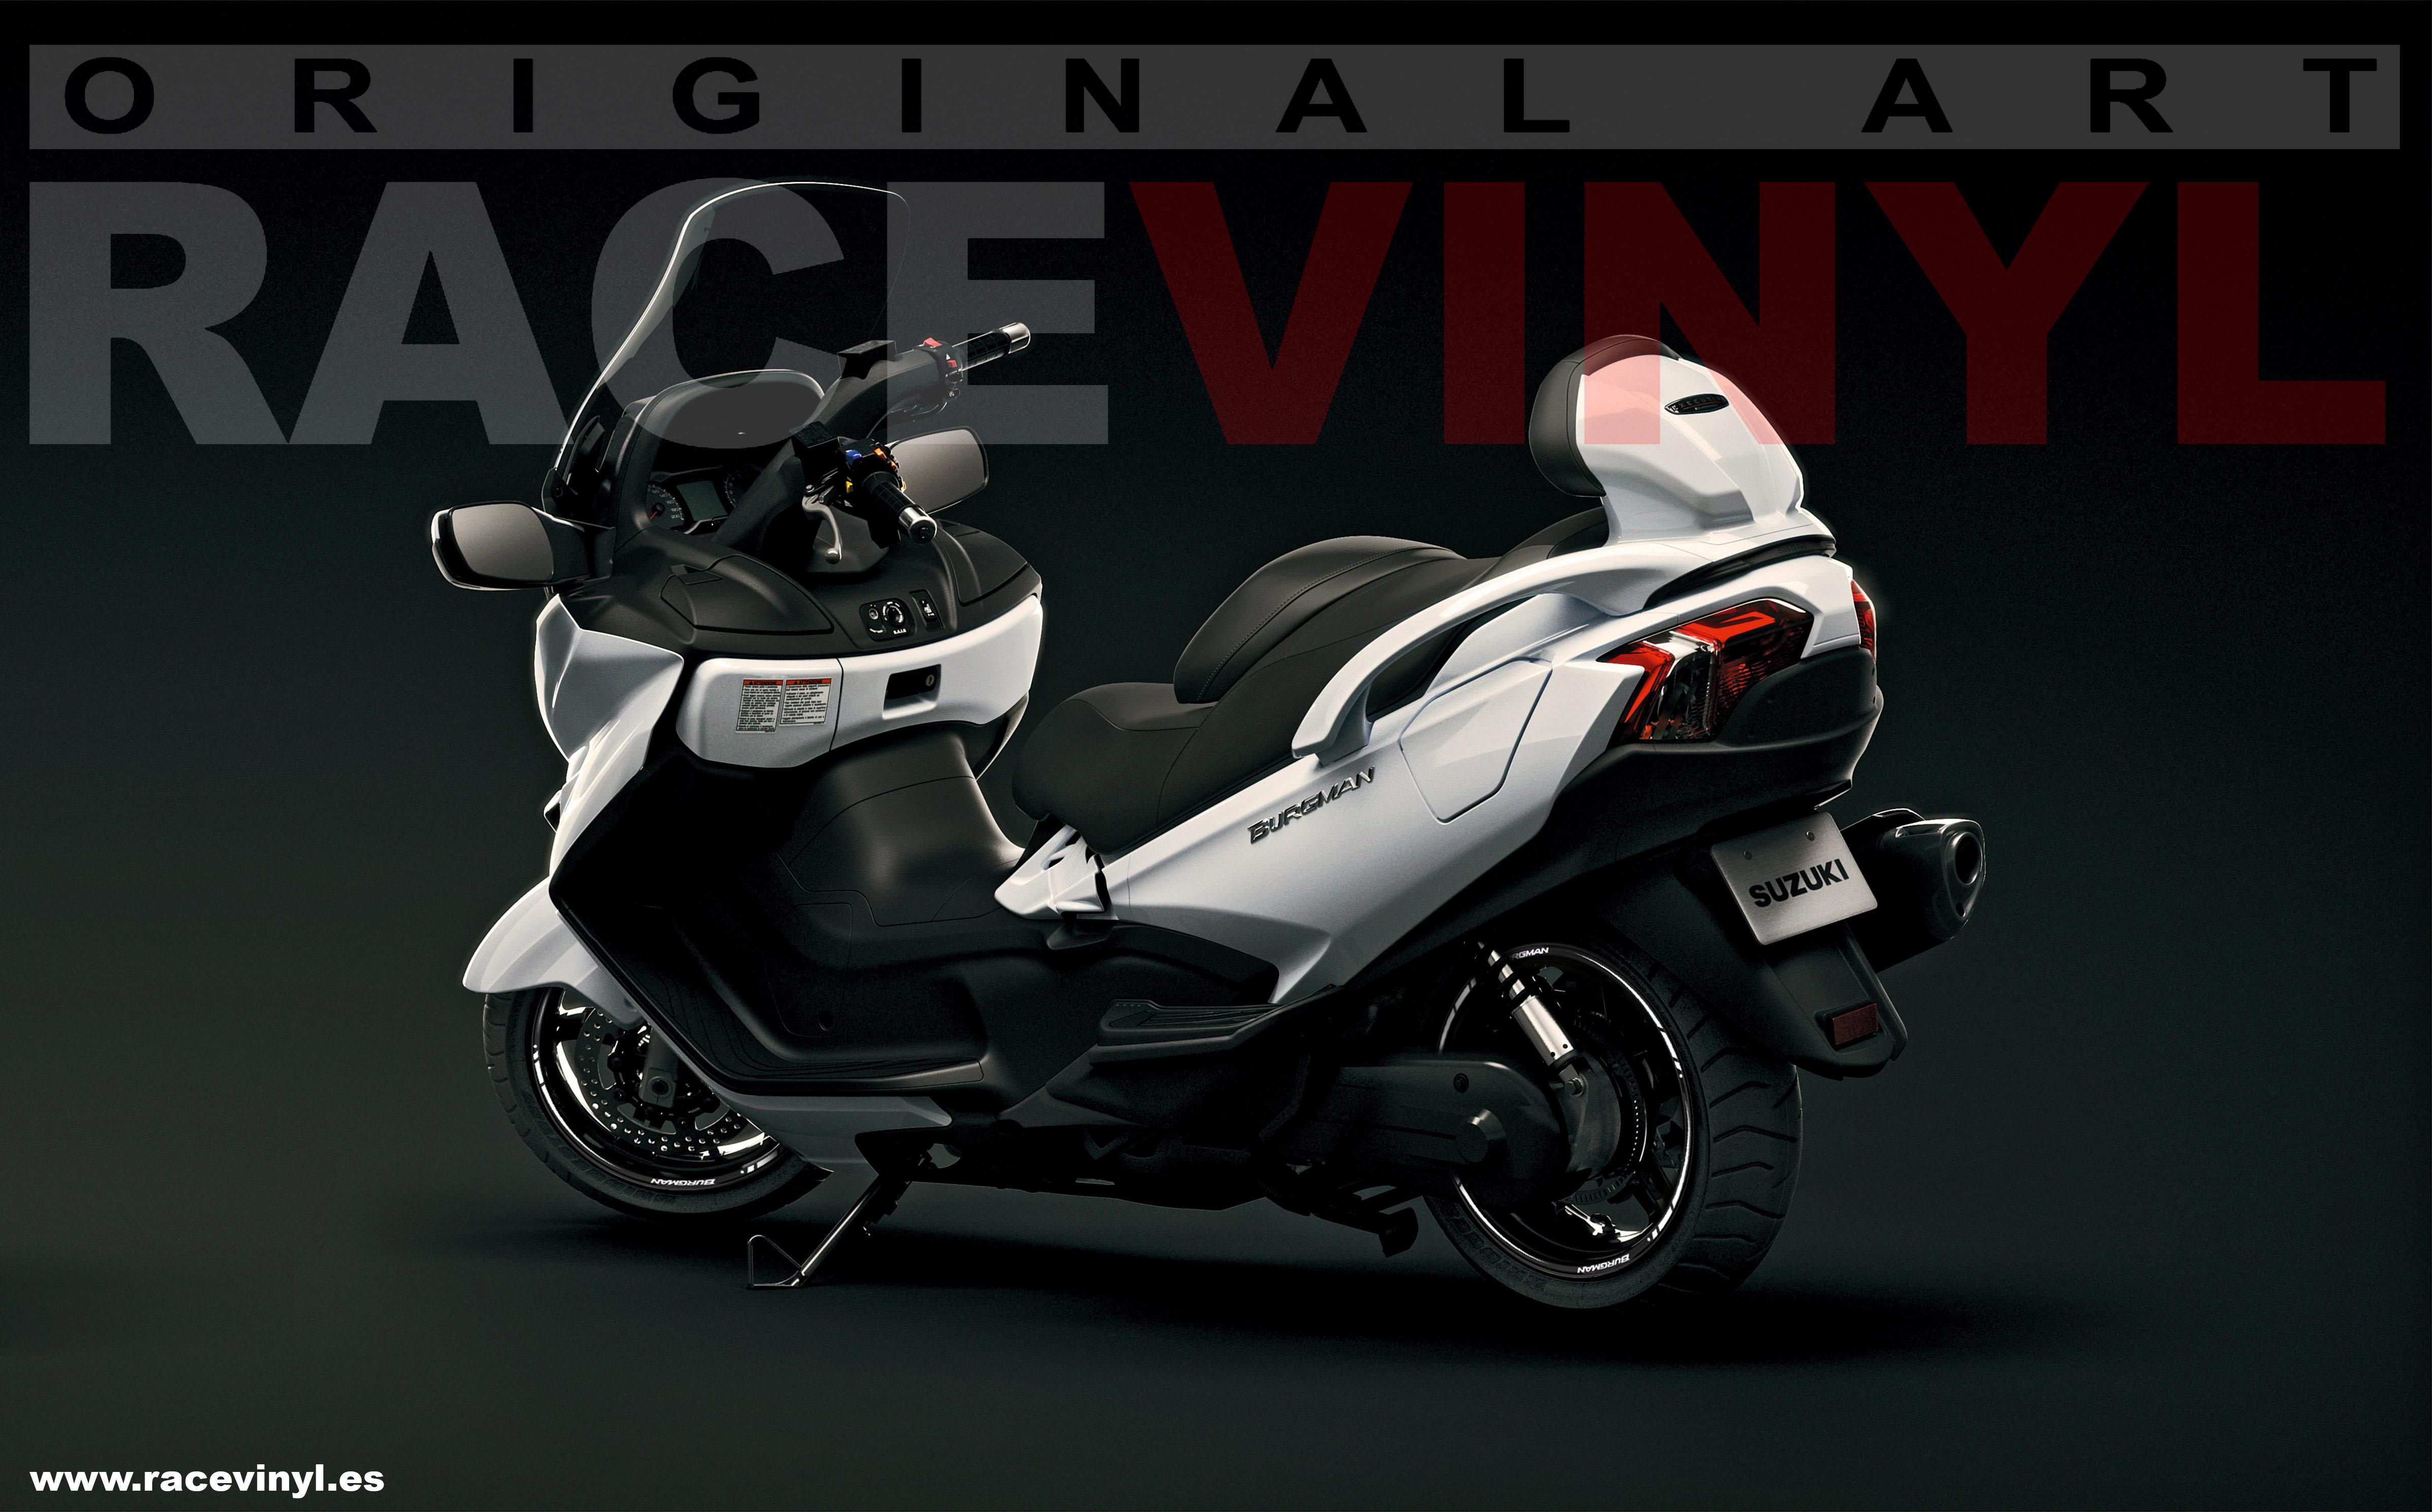 Suzuki Burgman New Rim Stripes Kit Available Racevinyl Europe - Vinyl stripes for motorcycles